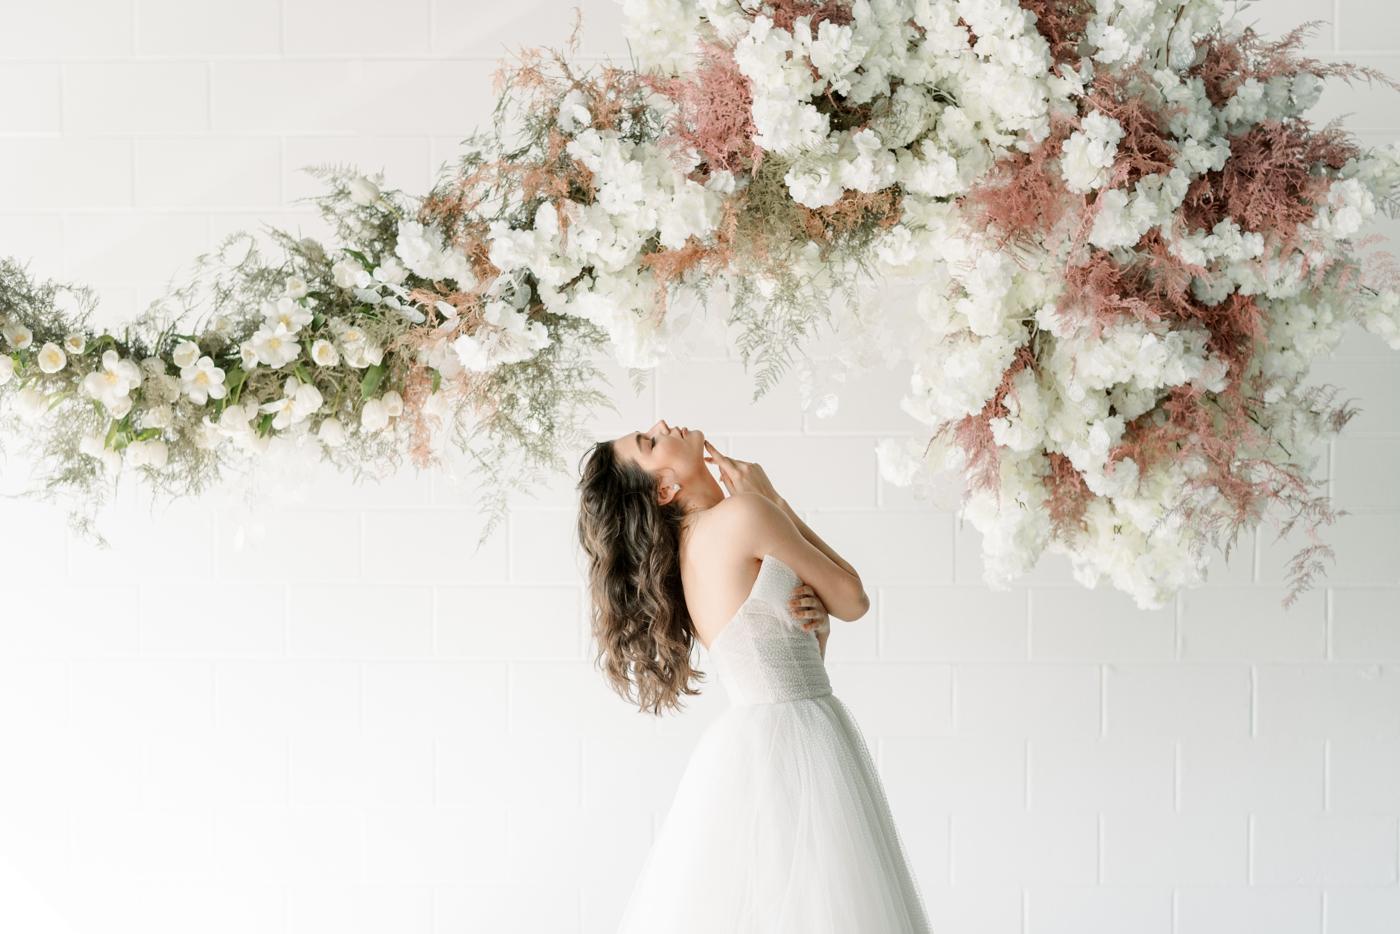 dreamy wedding photography